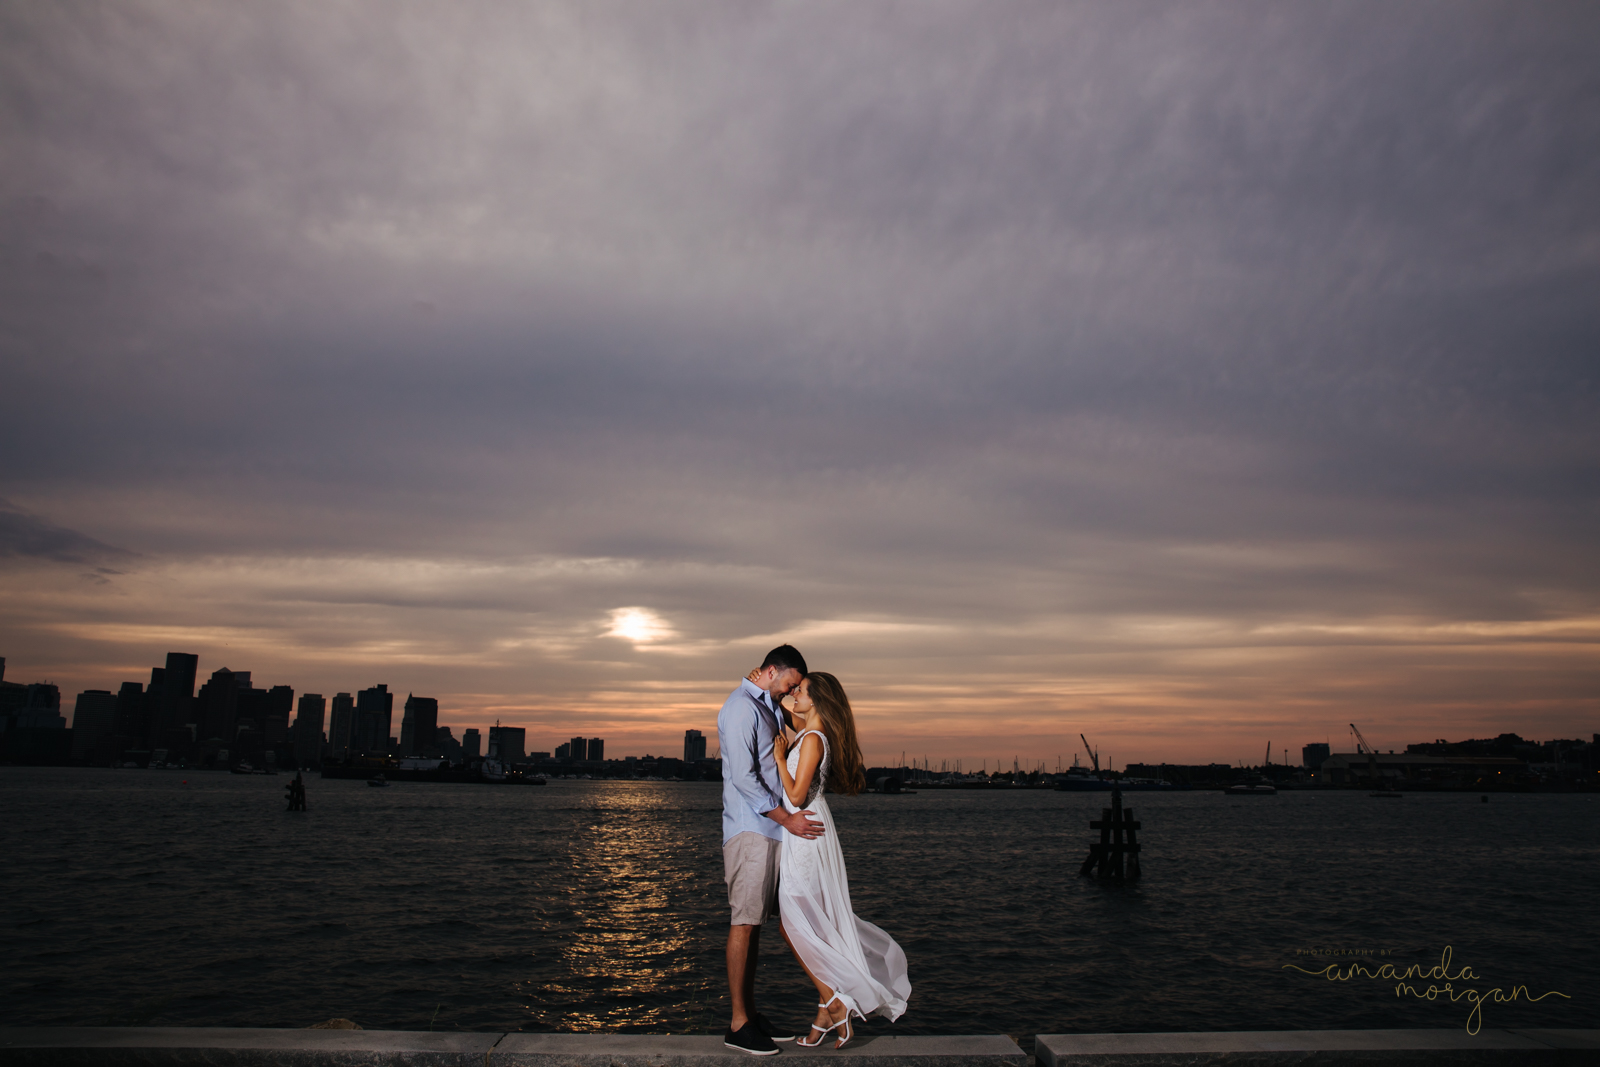 Hyatt-Regency-Boston-Harbor-Wedding-Amanda-Morgan-11.jpg